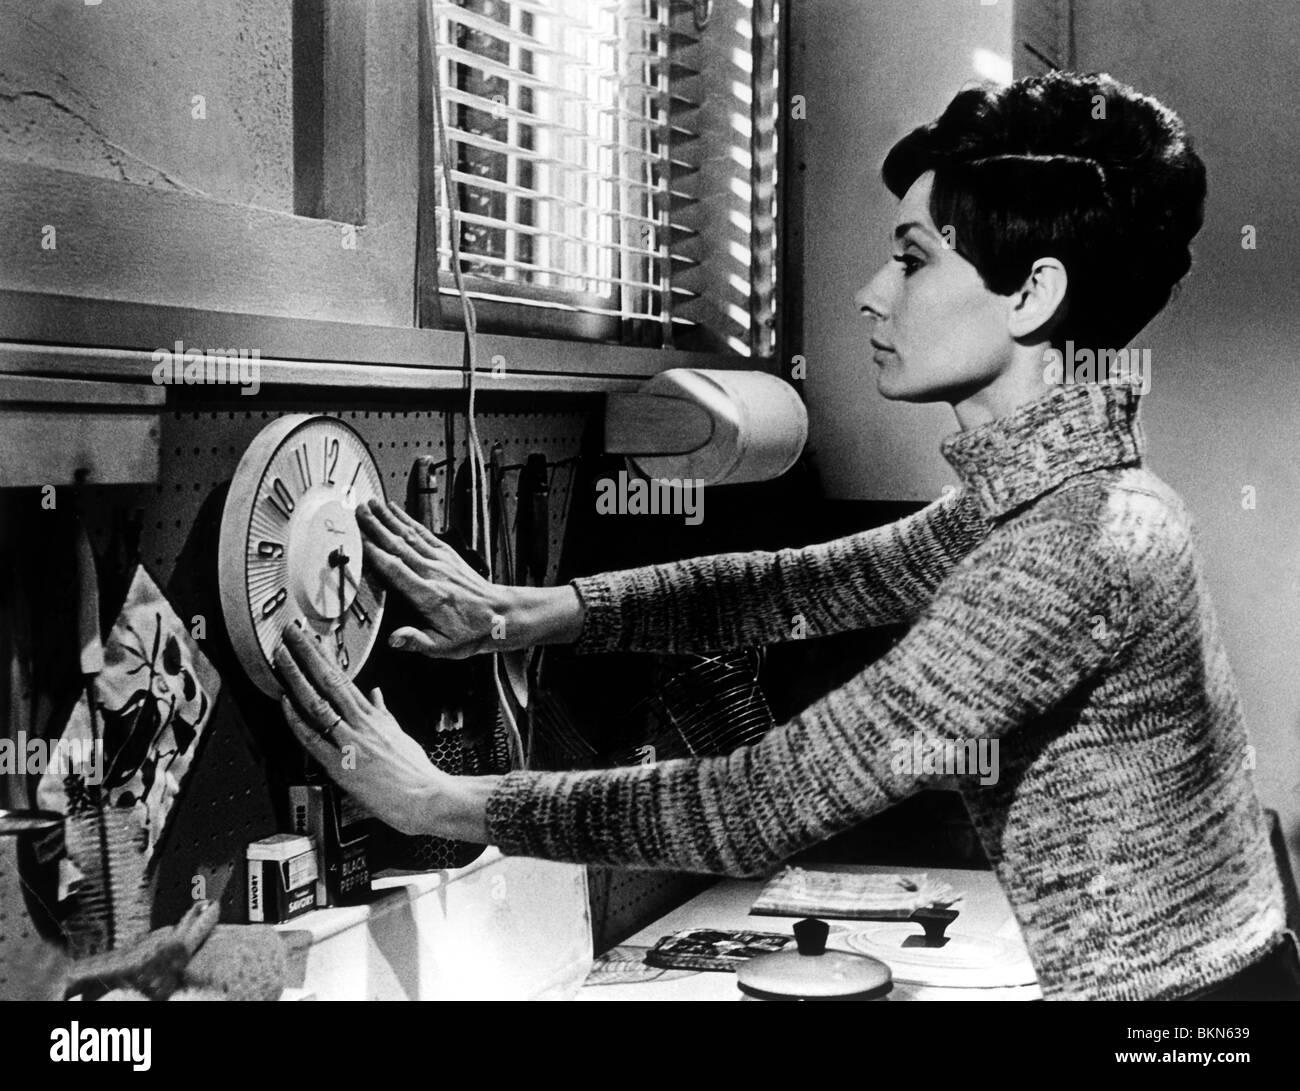 WAIT UNTIL DARK (1967) AUDREY HEPBURN WUD 001P - Stock Image